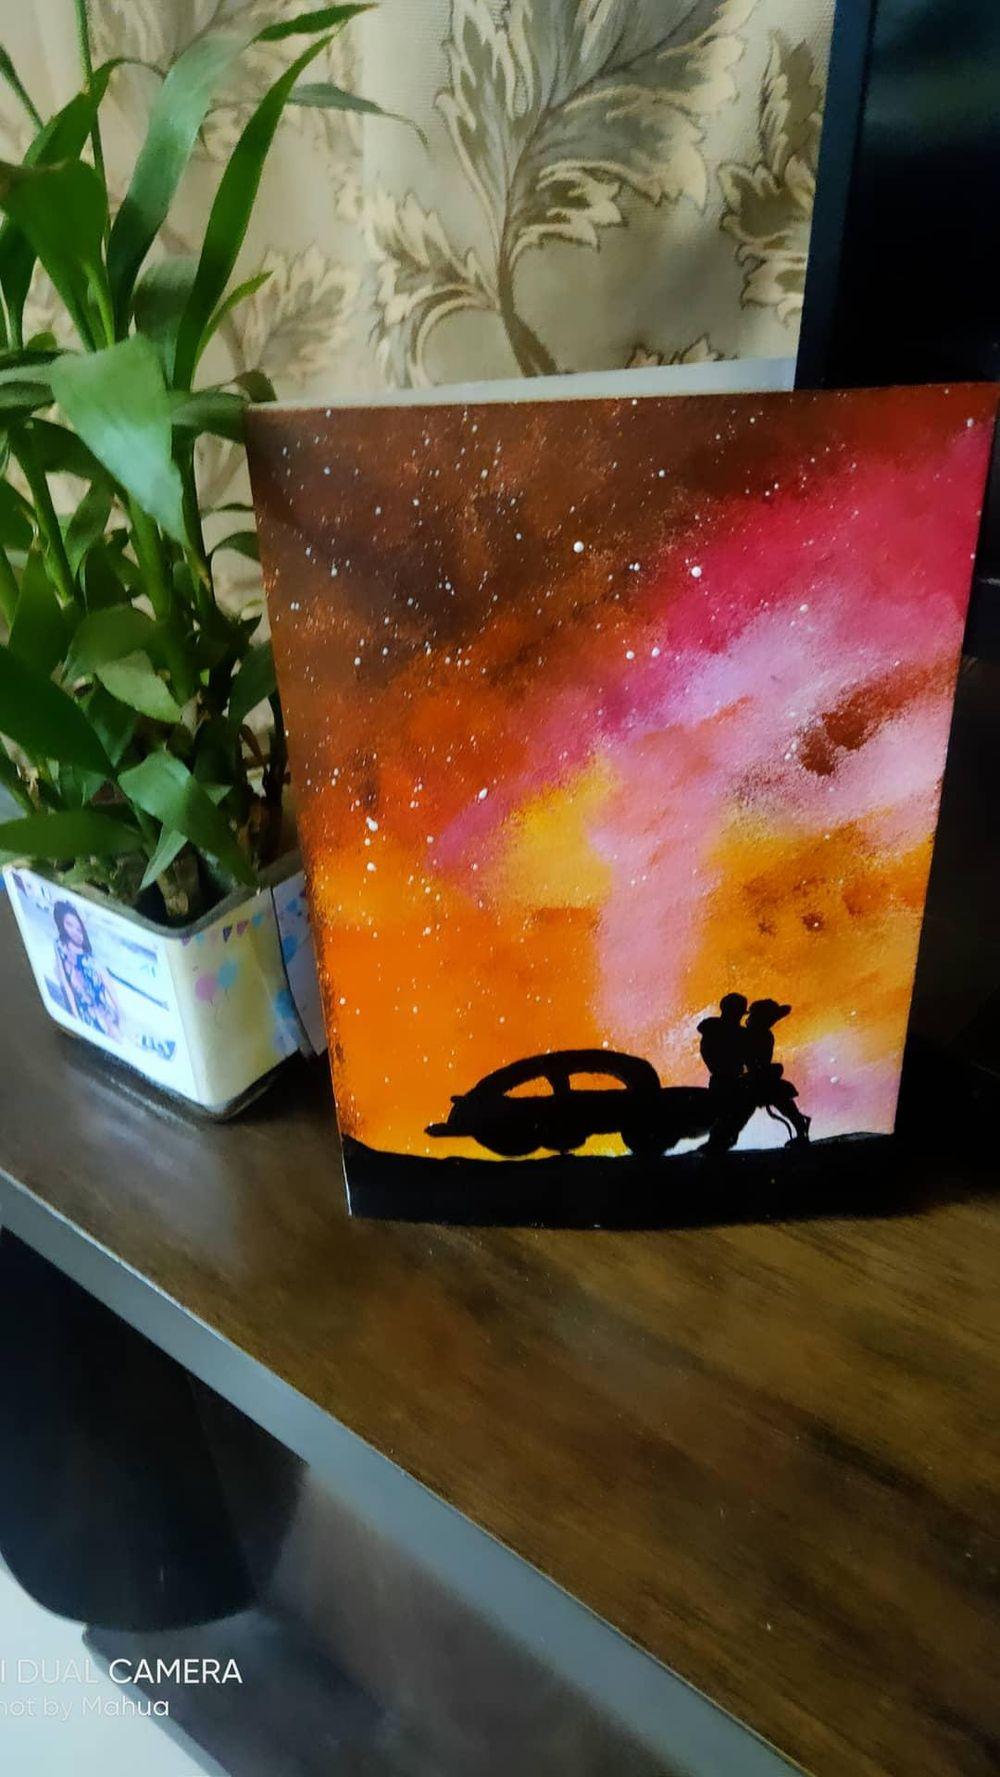 Romantic Sponge Paintings - image 2 - student project